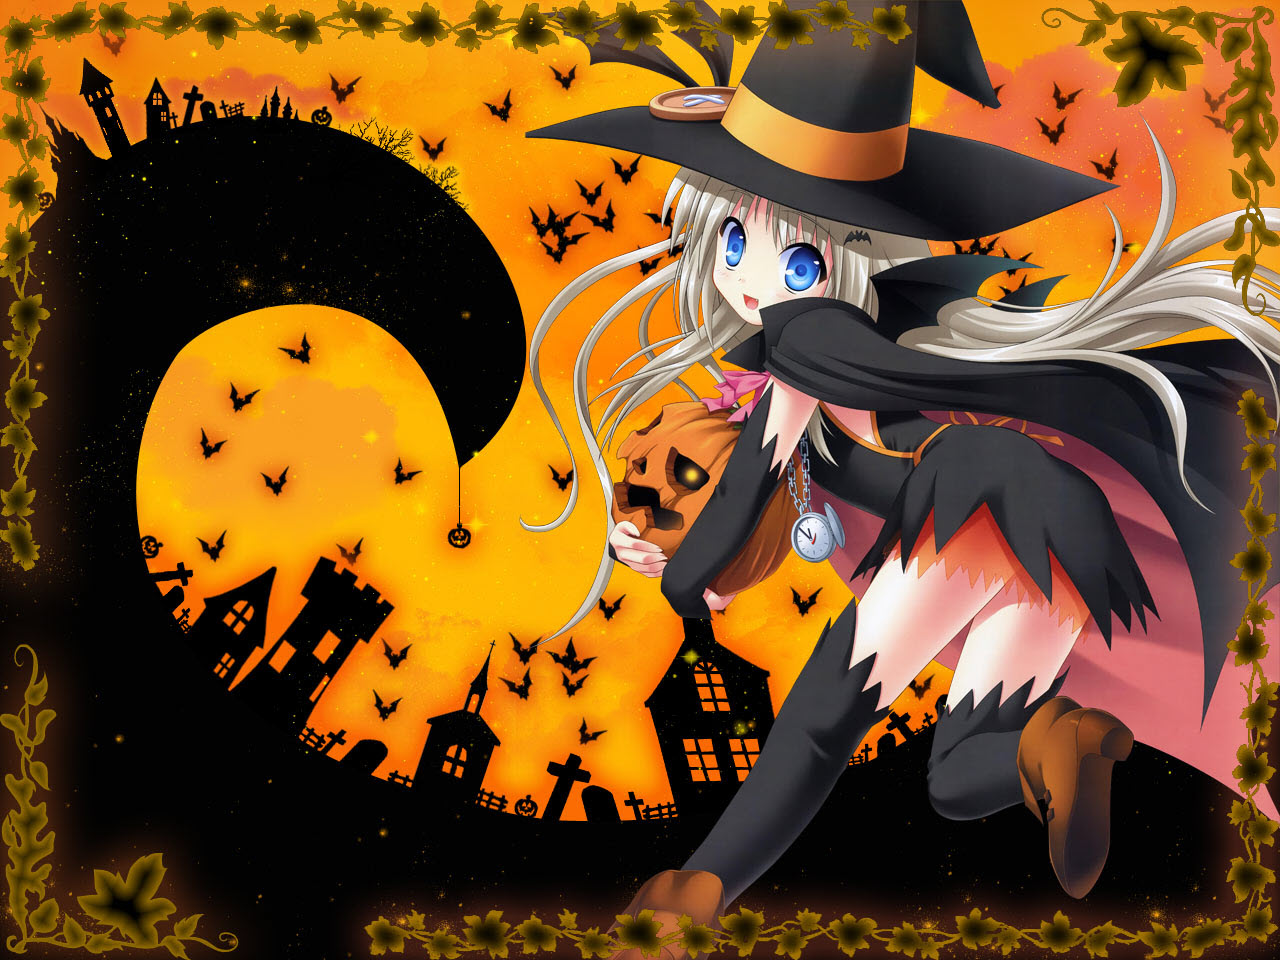 Halloween Anime Girl Beauty Wallpaper Important Wallpapers 1280x960